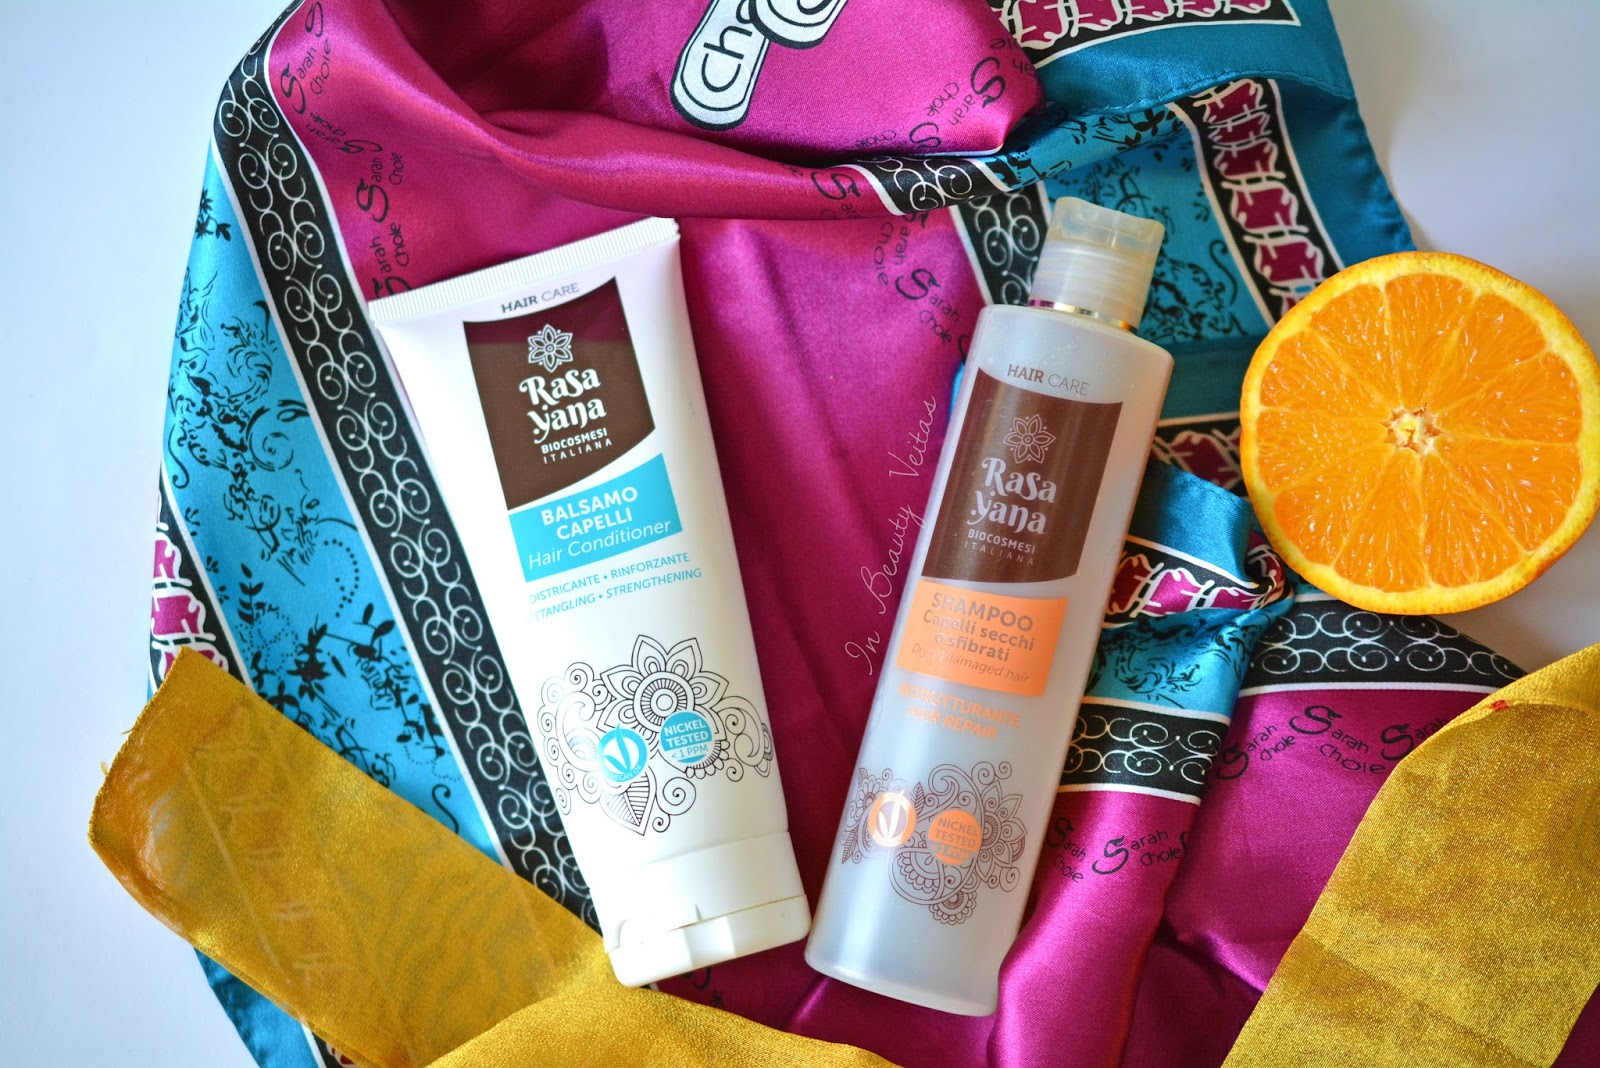 rasayana capelli, rasayana shampoo ristrutturante, rasayana balsamo, rasayana recensione, rasayana review, rasayana recensione